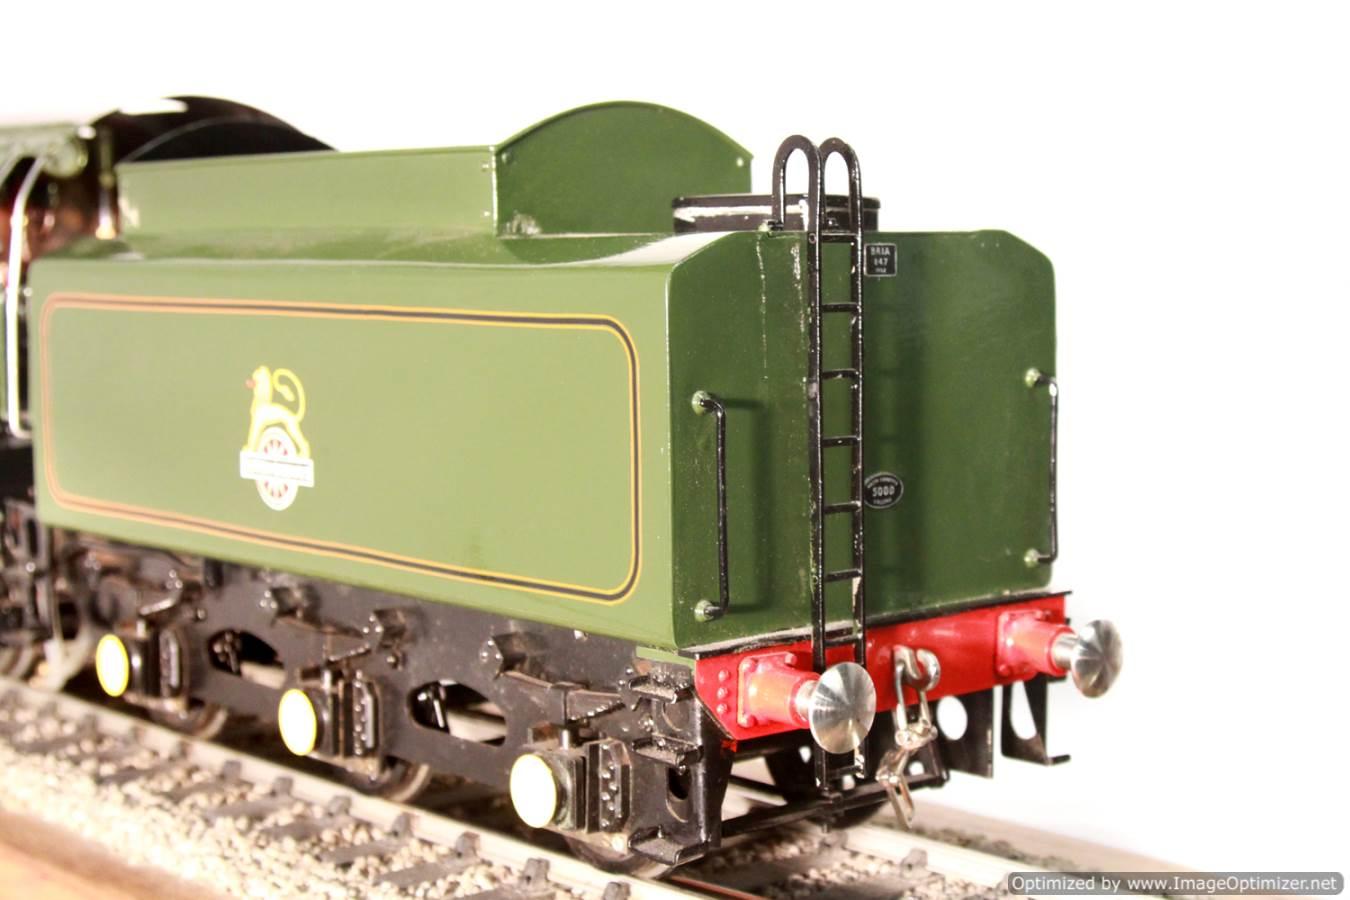 test BR Britannia live steam locomotive for sale 12 Optimized